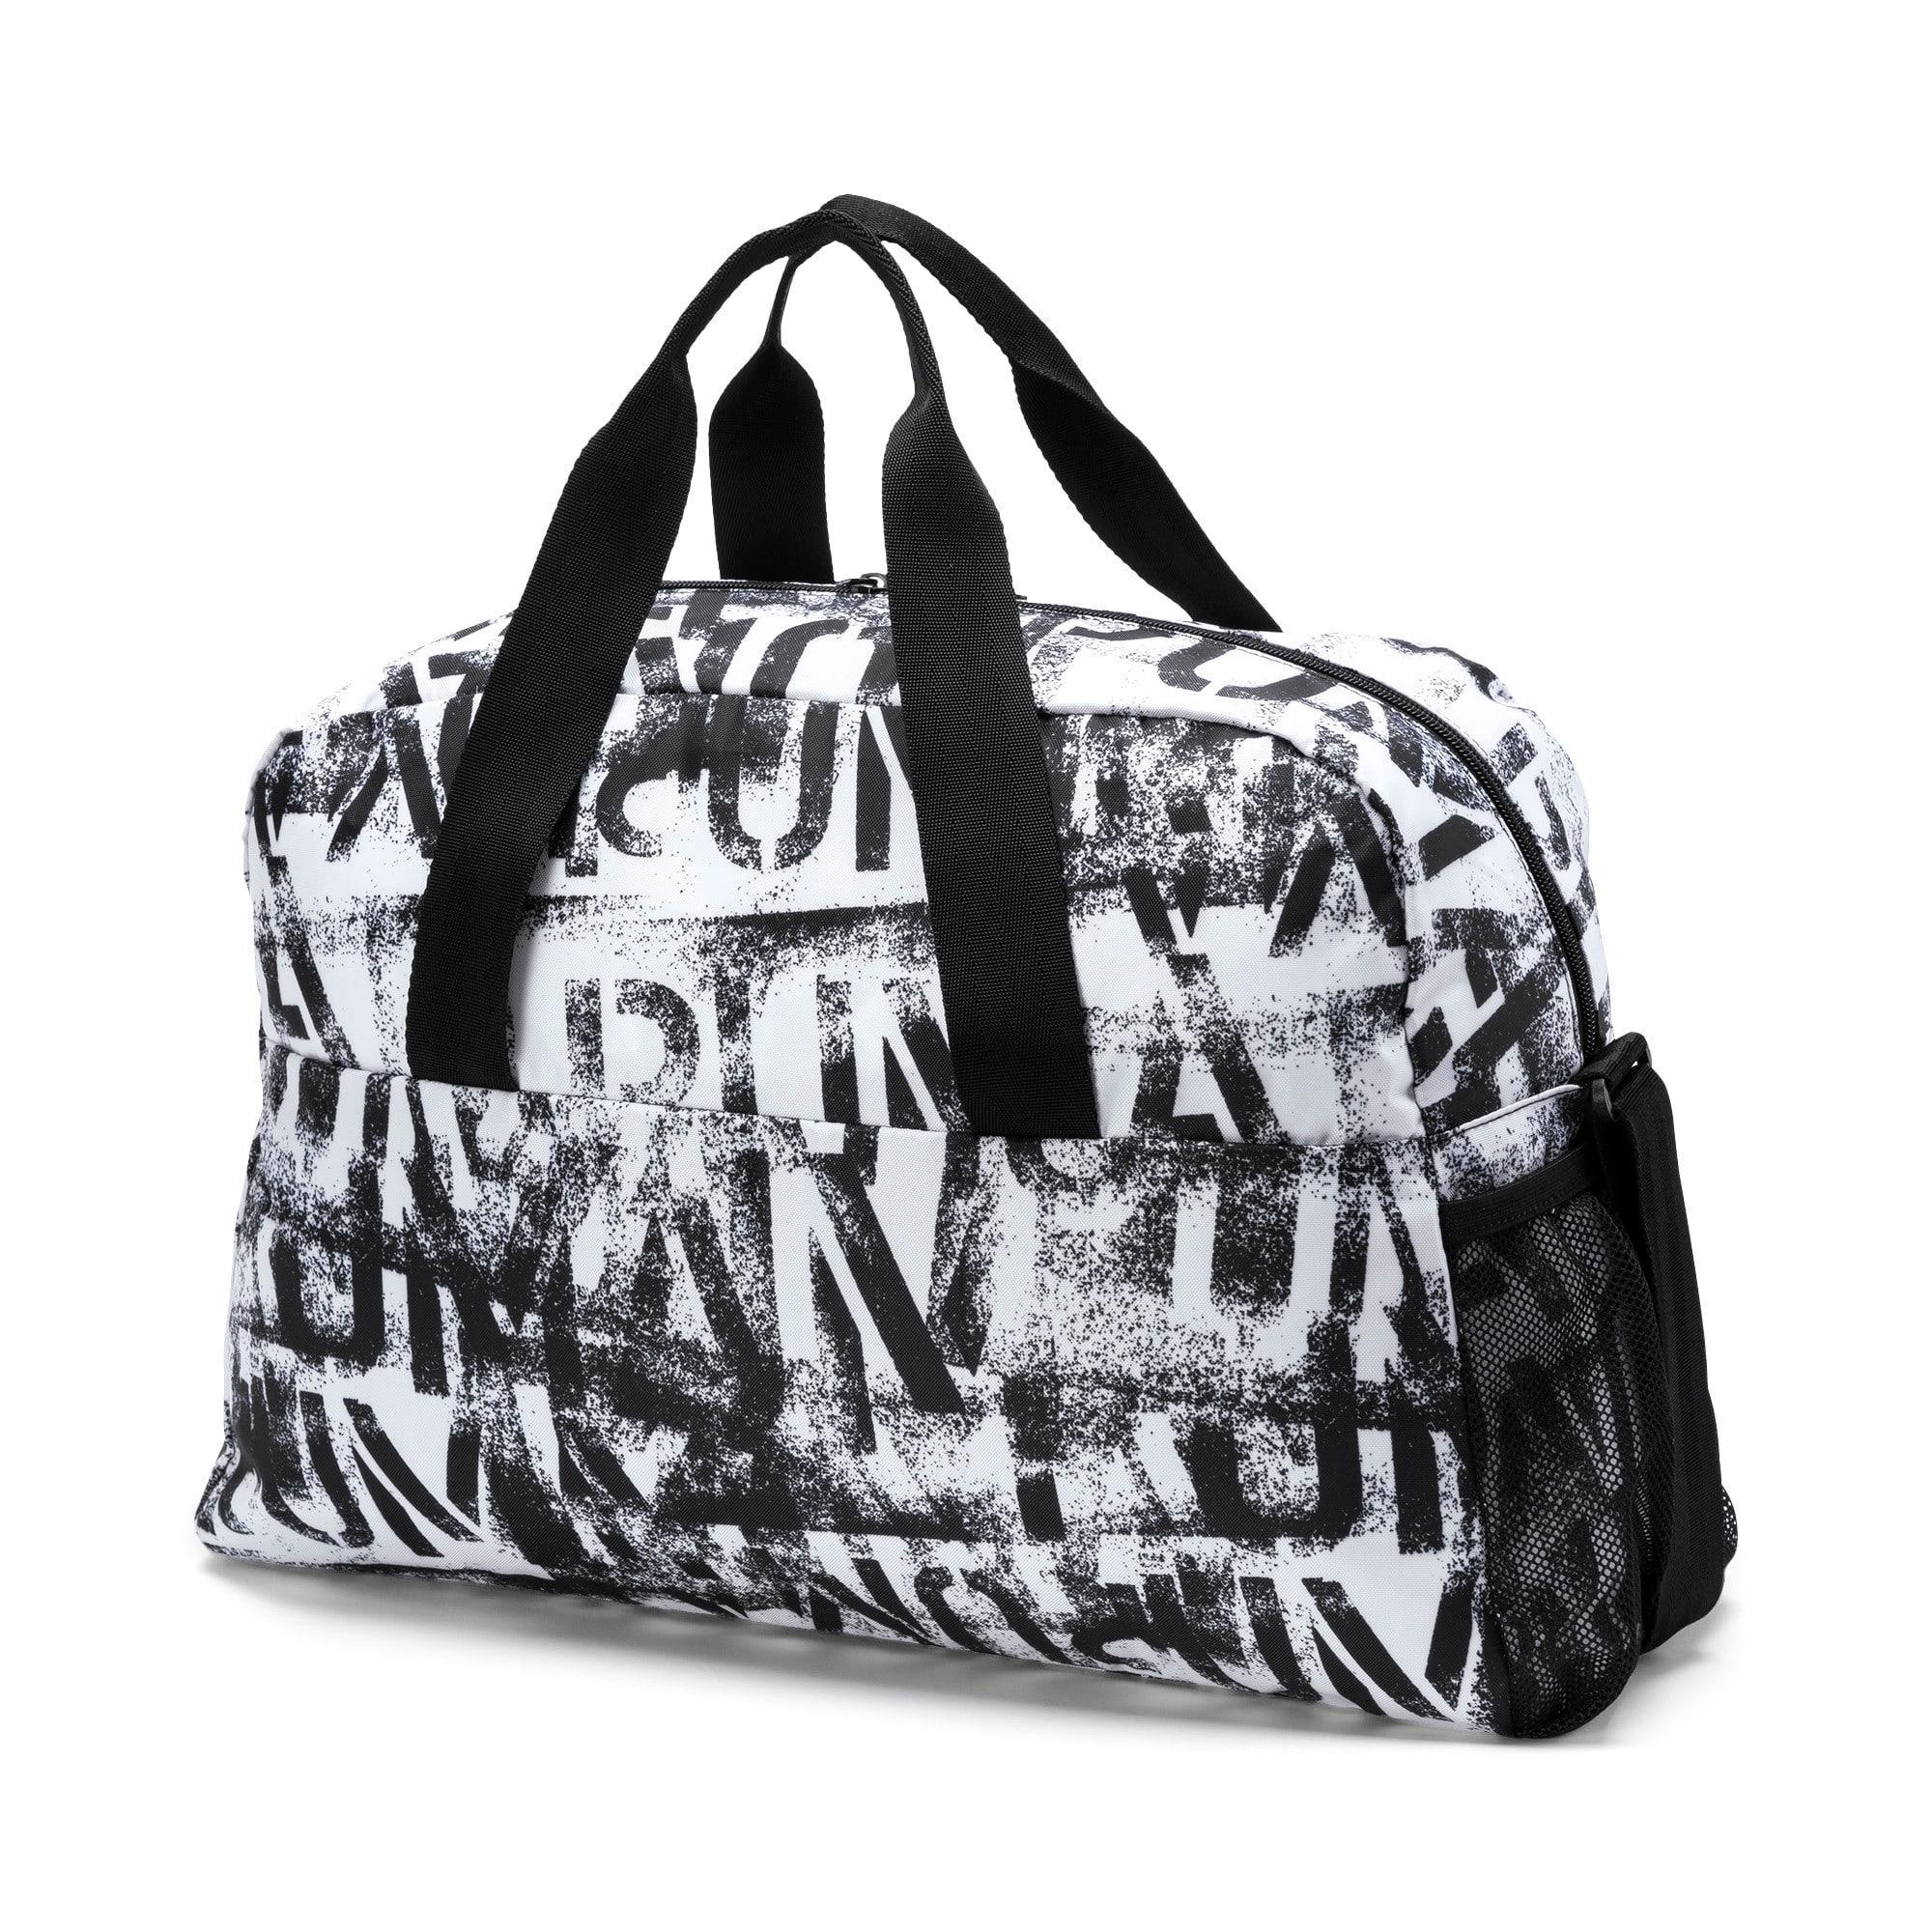 Thumbnail 3 of AT ESS Grip Bag, Puma White-Puma Black-AOP, medium